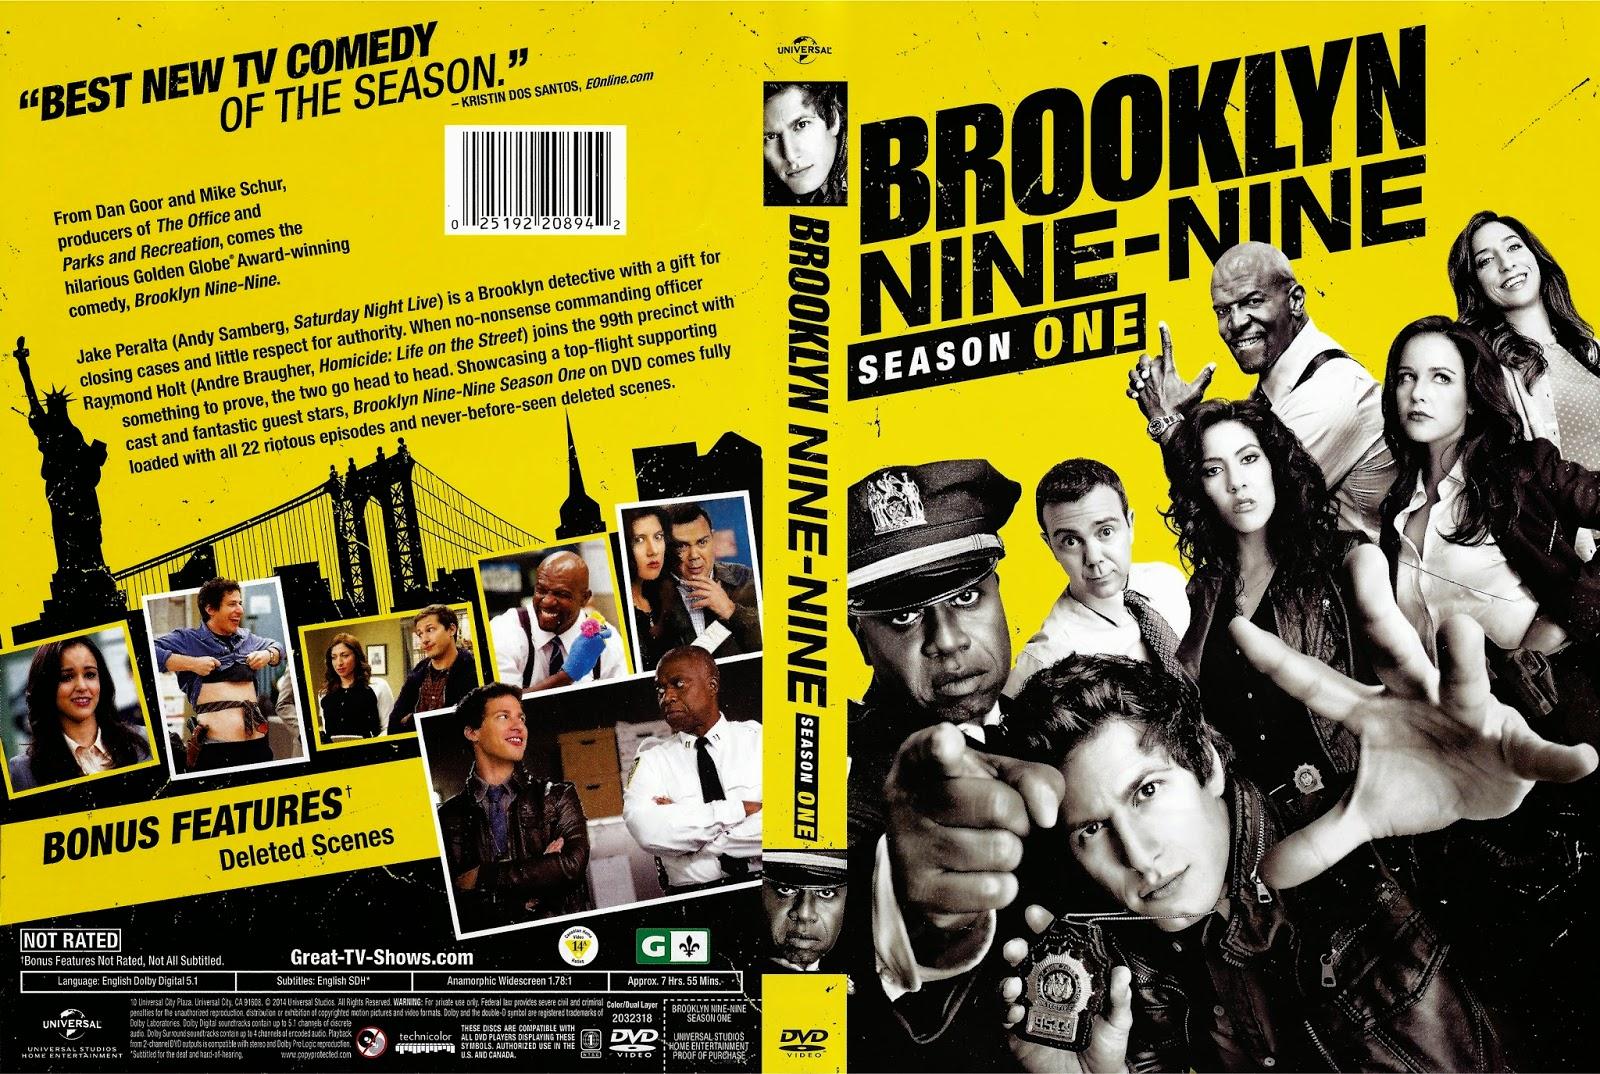 Brooklyn Nine Nine 1ª Temporada Completa 720p BRRip X264 Dublado getdvdcovers brooklyn nine nine 2014 r1 front